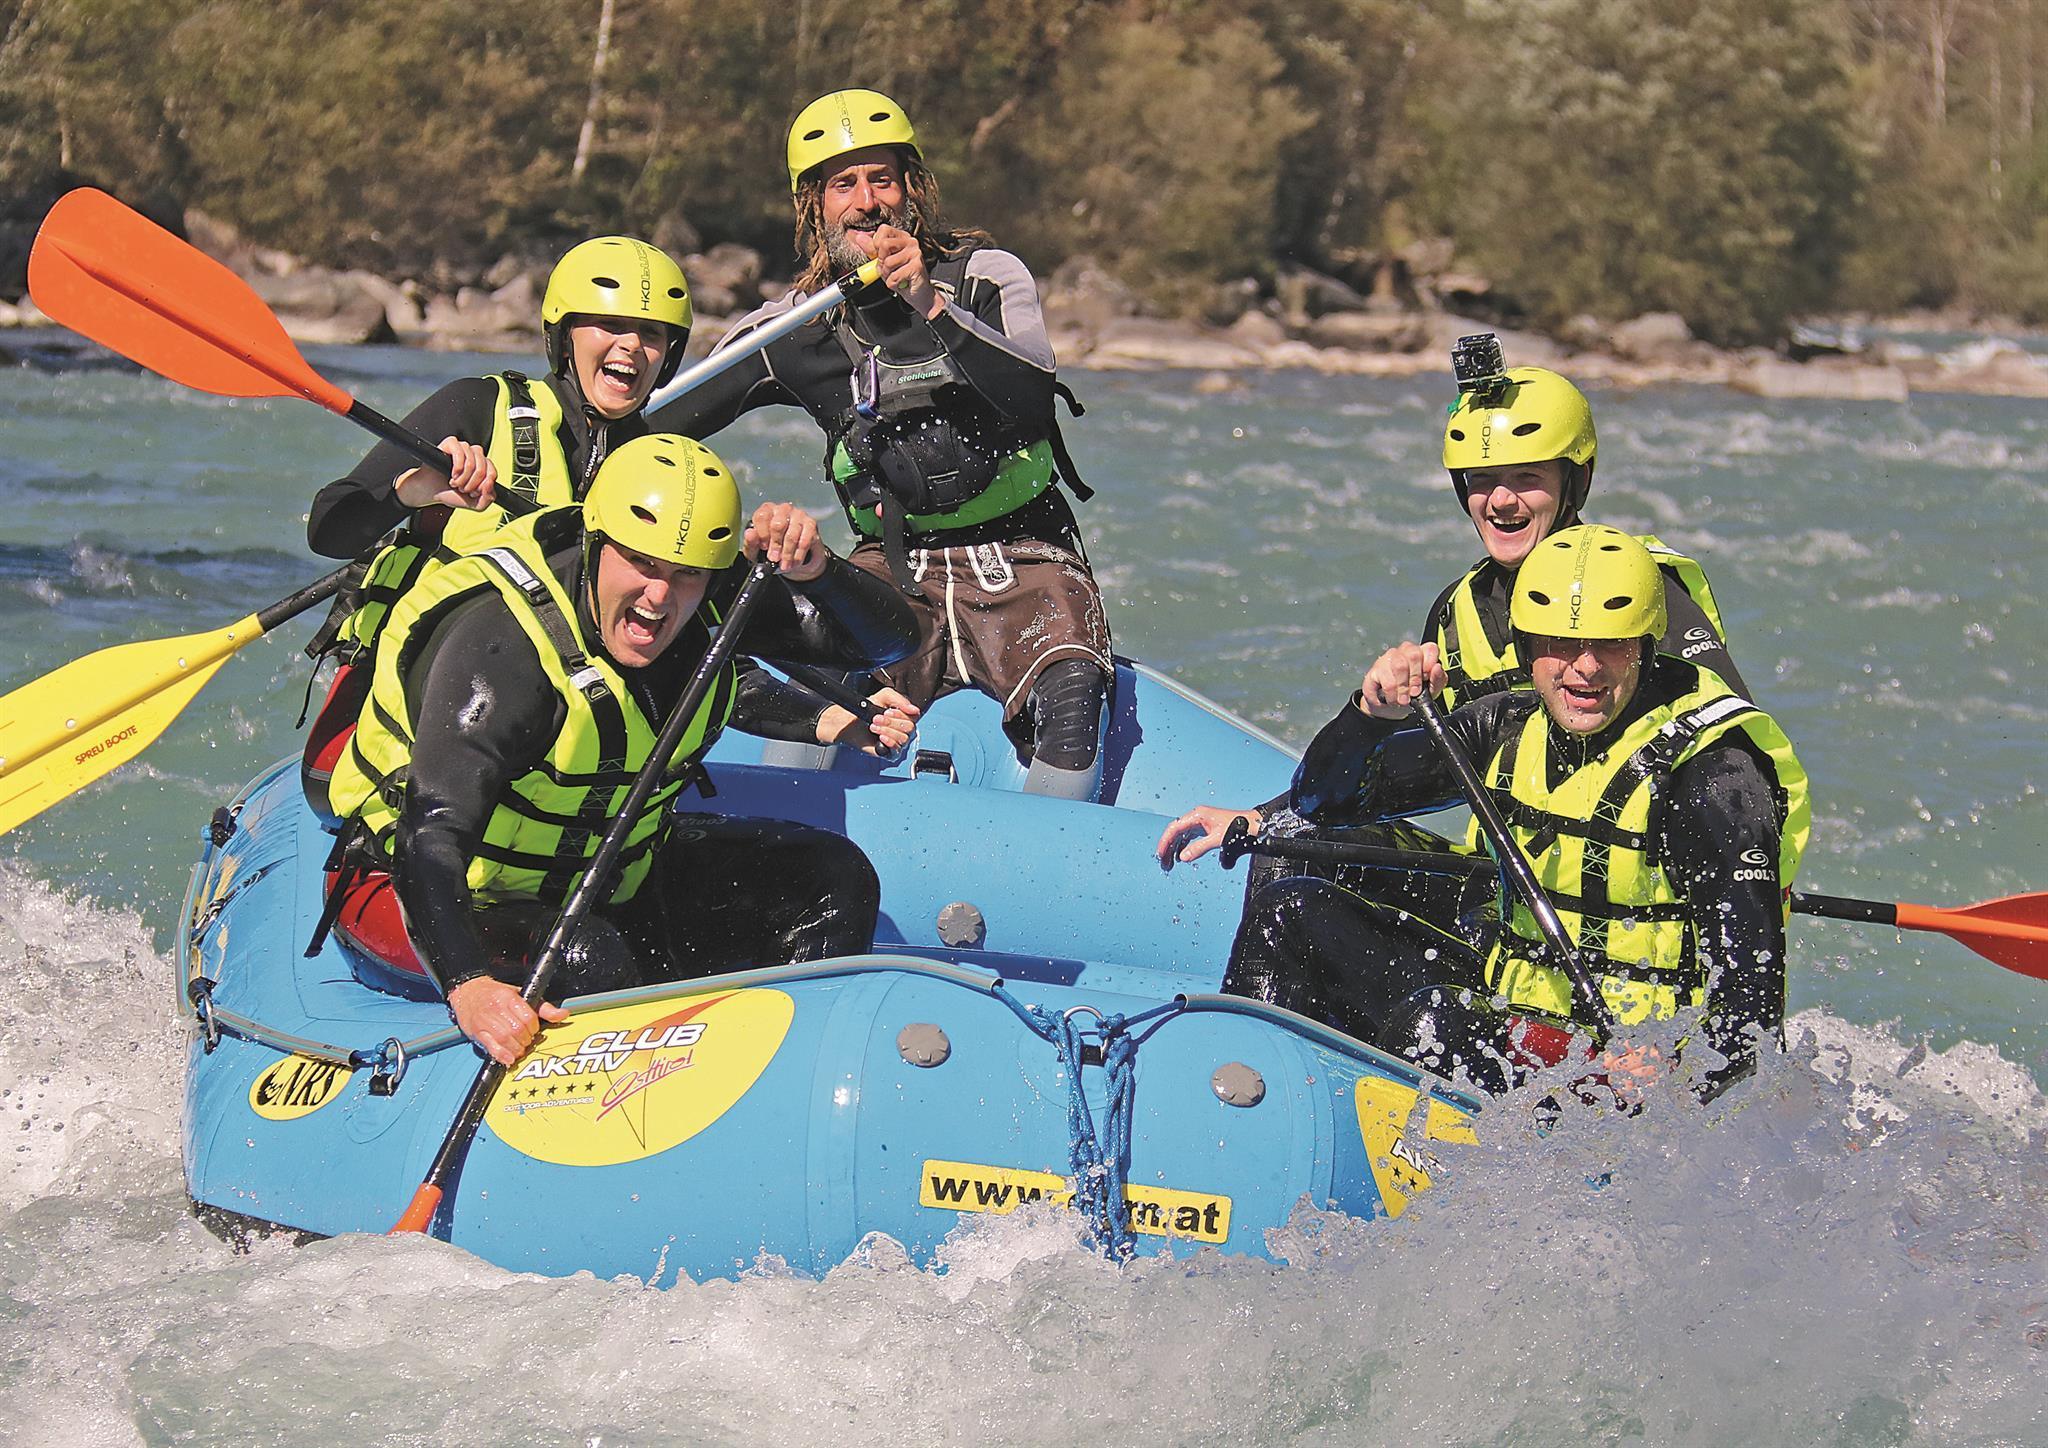 Rafting-Tour-Cools-Lienz.jpg